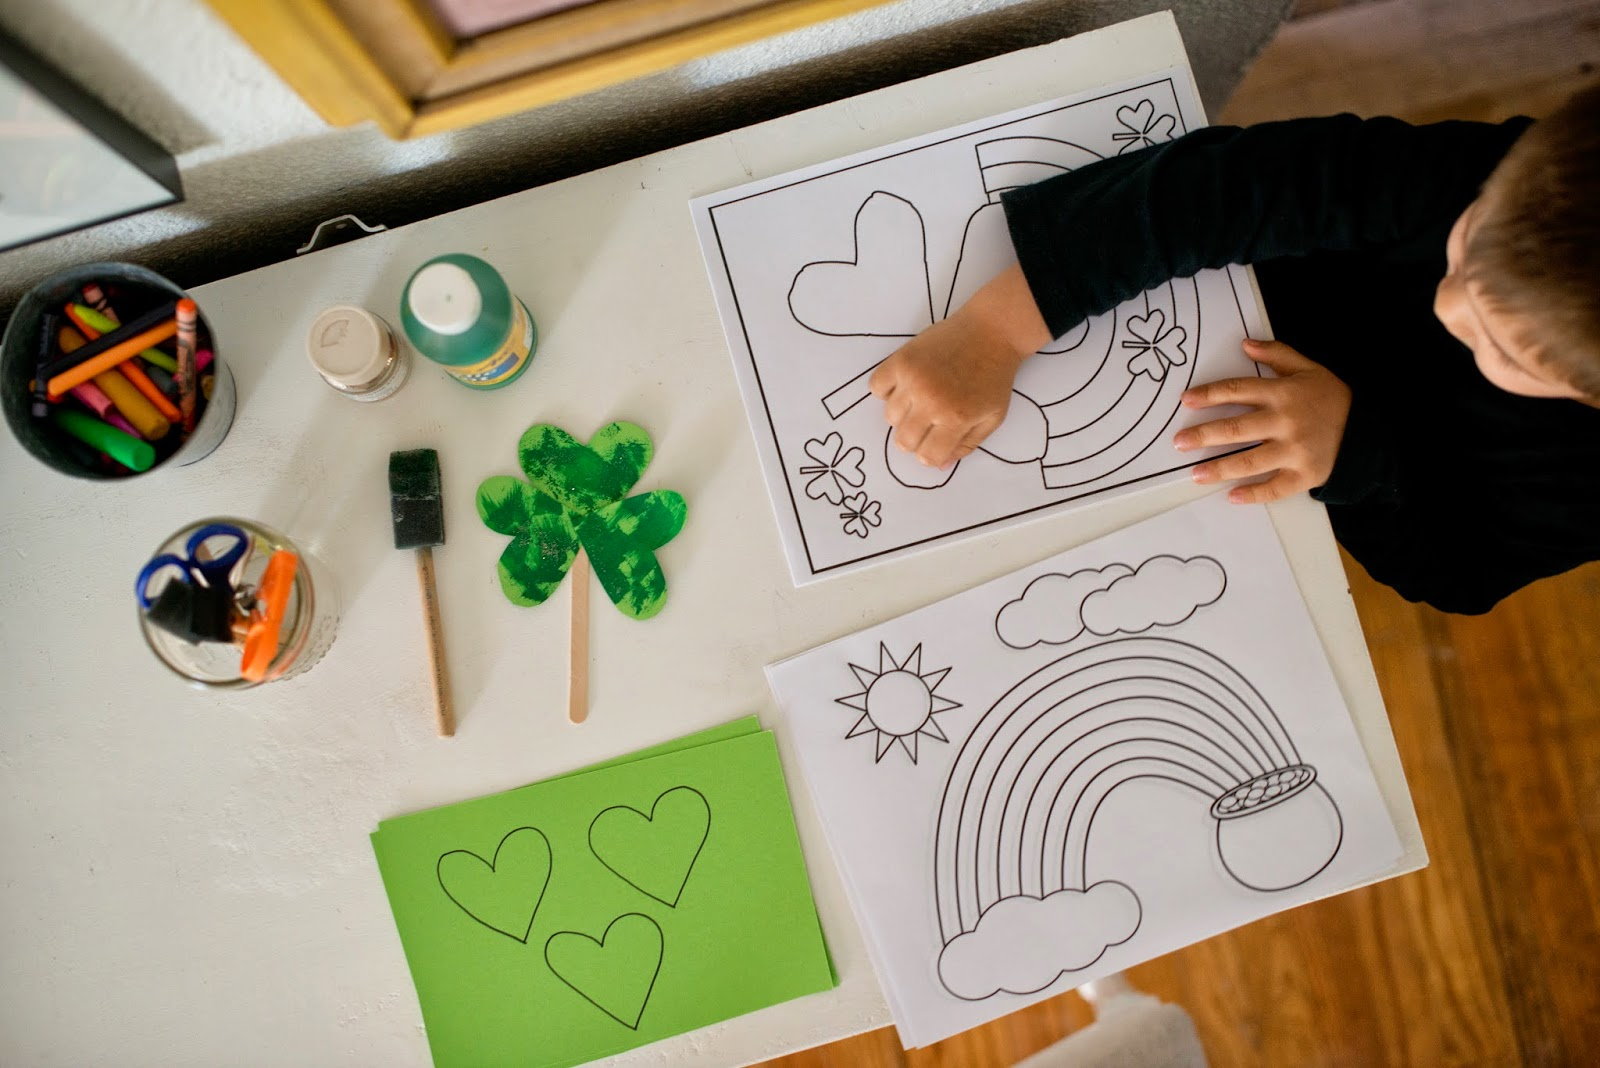 Saint Patrick's Day Kid Party Ideas